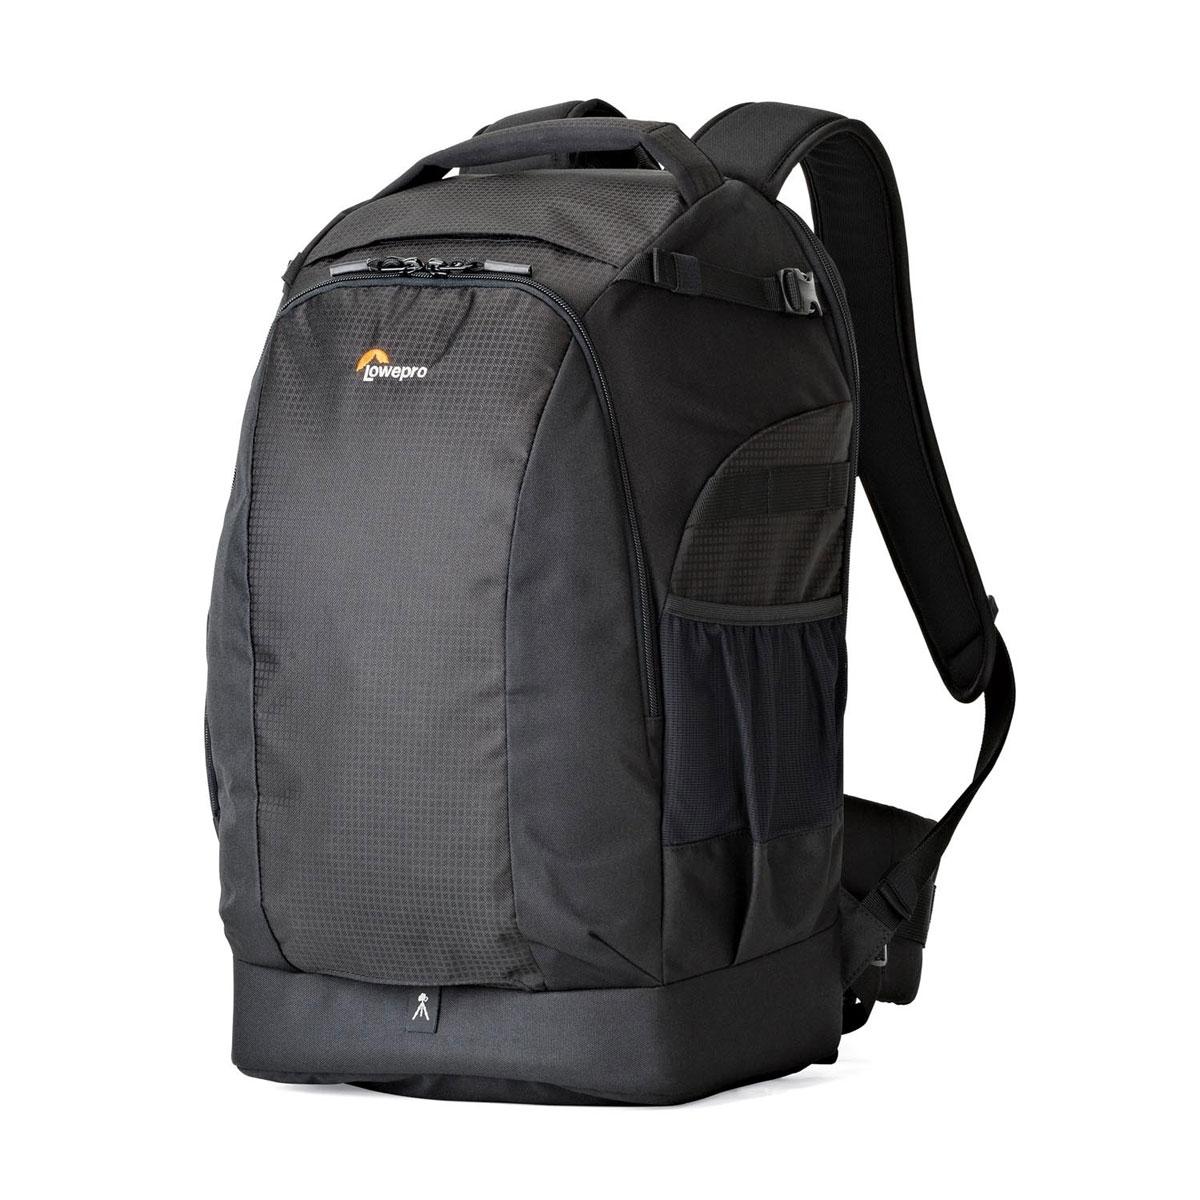 Lowepro Flipside 500 Aw Ii Backpack Black Toploader Zoom 55 Image Of